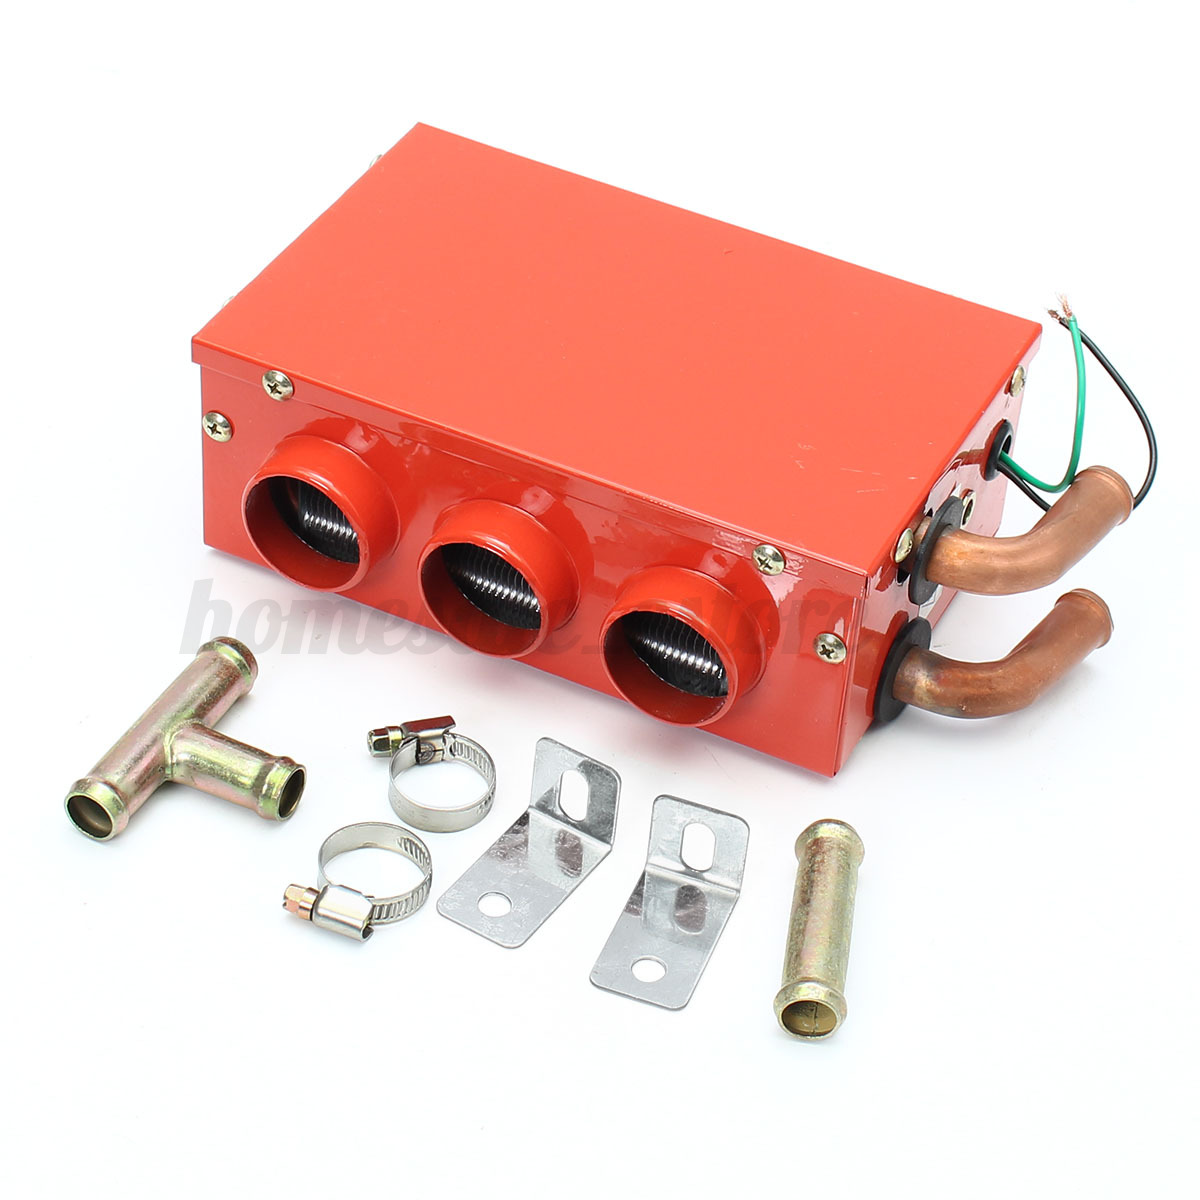 3-Hole-12V-24W-Portable-Car-Vehicle-Heating-Cooling-Heater-Demister-Defroster-1